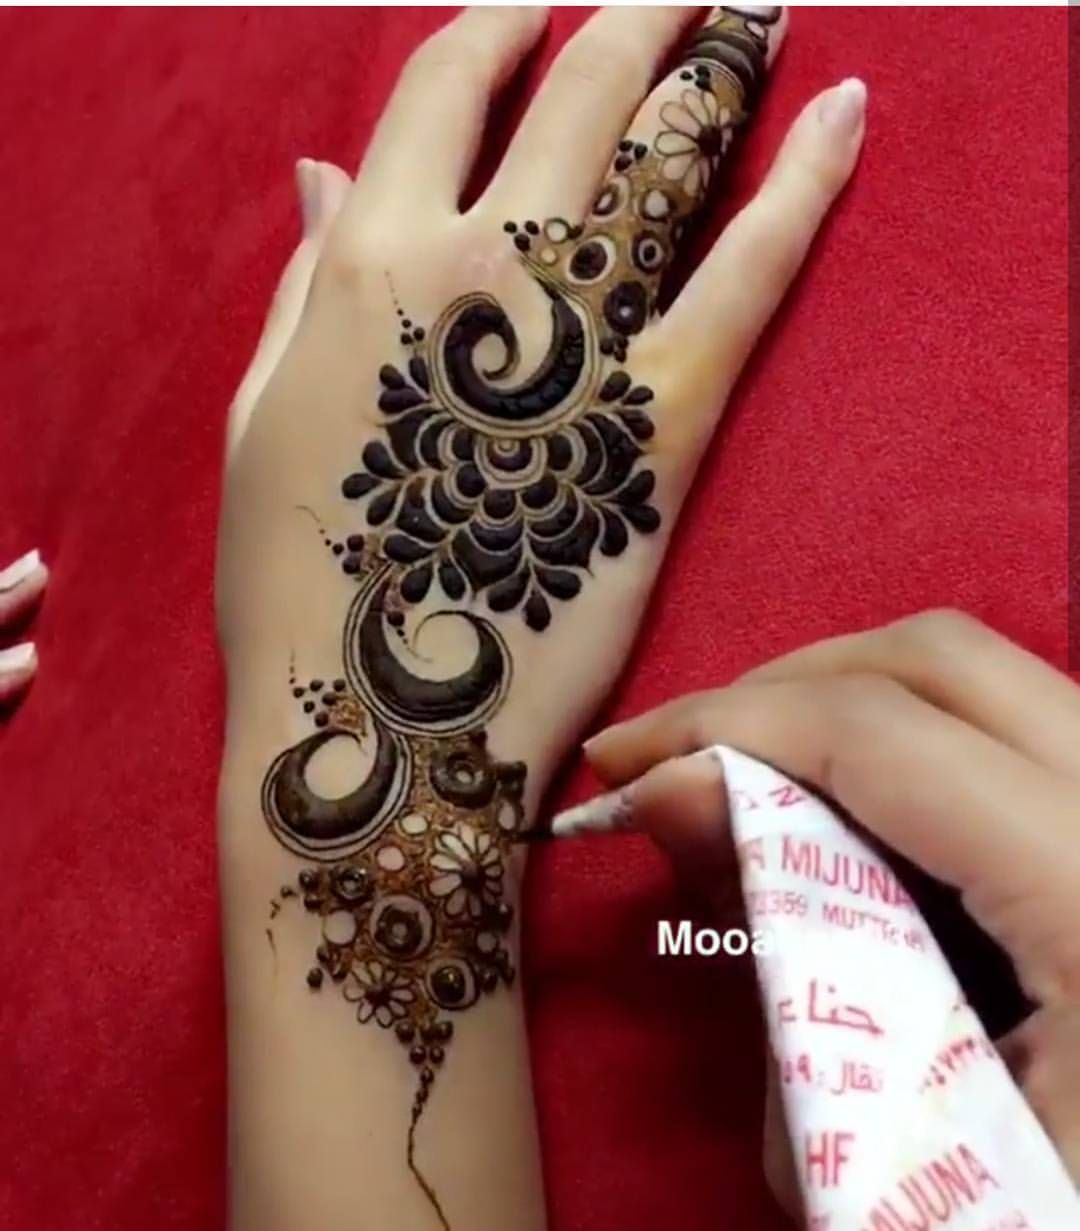 1 122 Likes 7 Comments Henna Artist Rifas Henna Alain On Instagram For Henna Bookings Modern Mehndi Designs Henna Designs Hand Beautiful Henna Designs